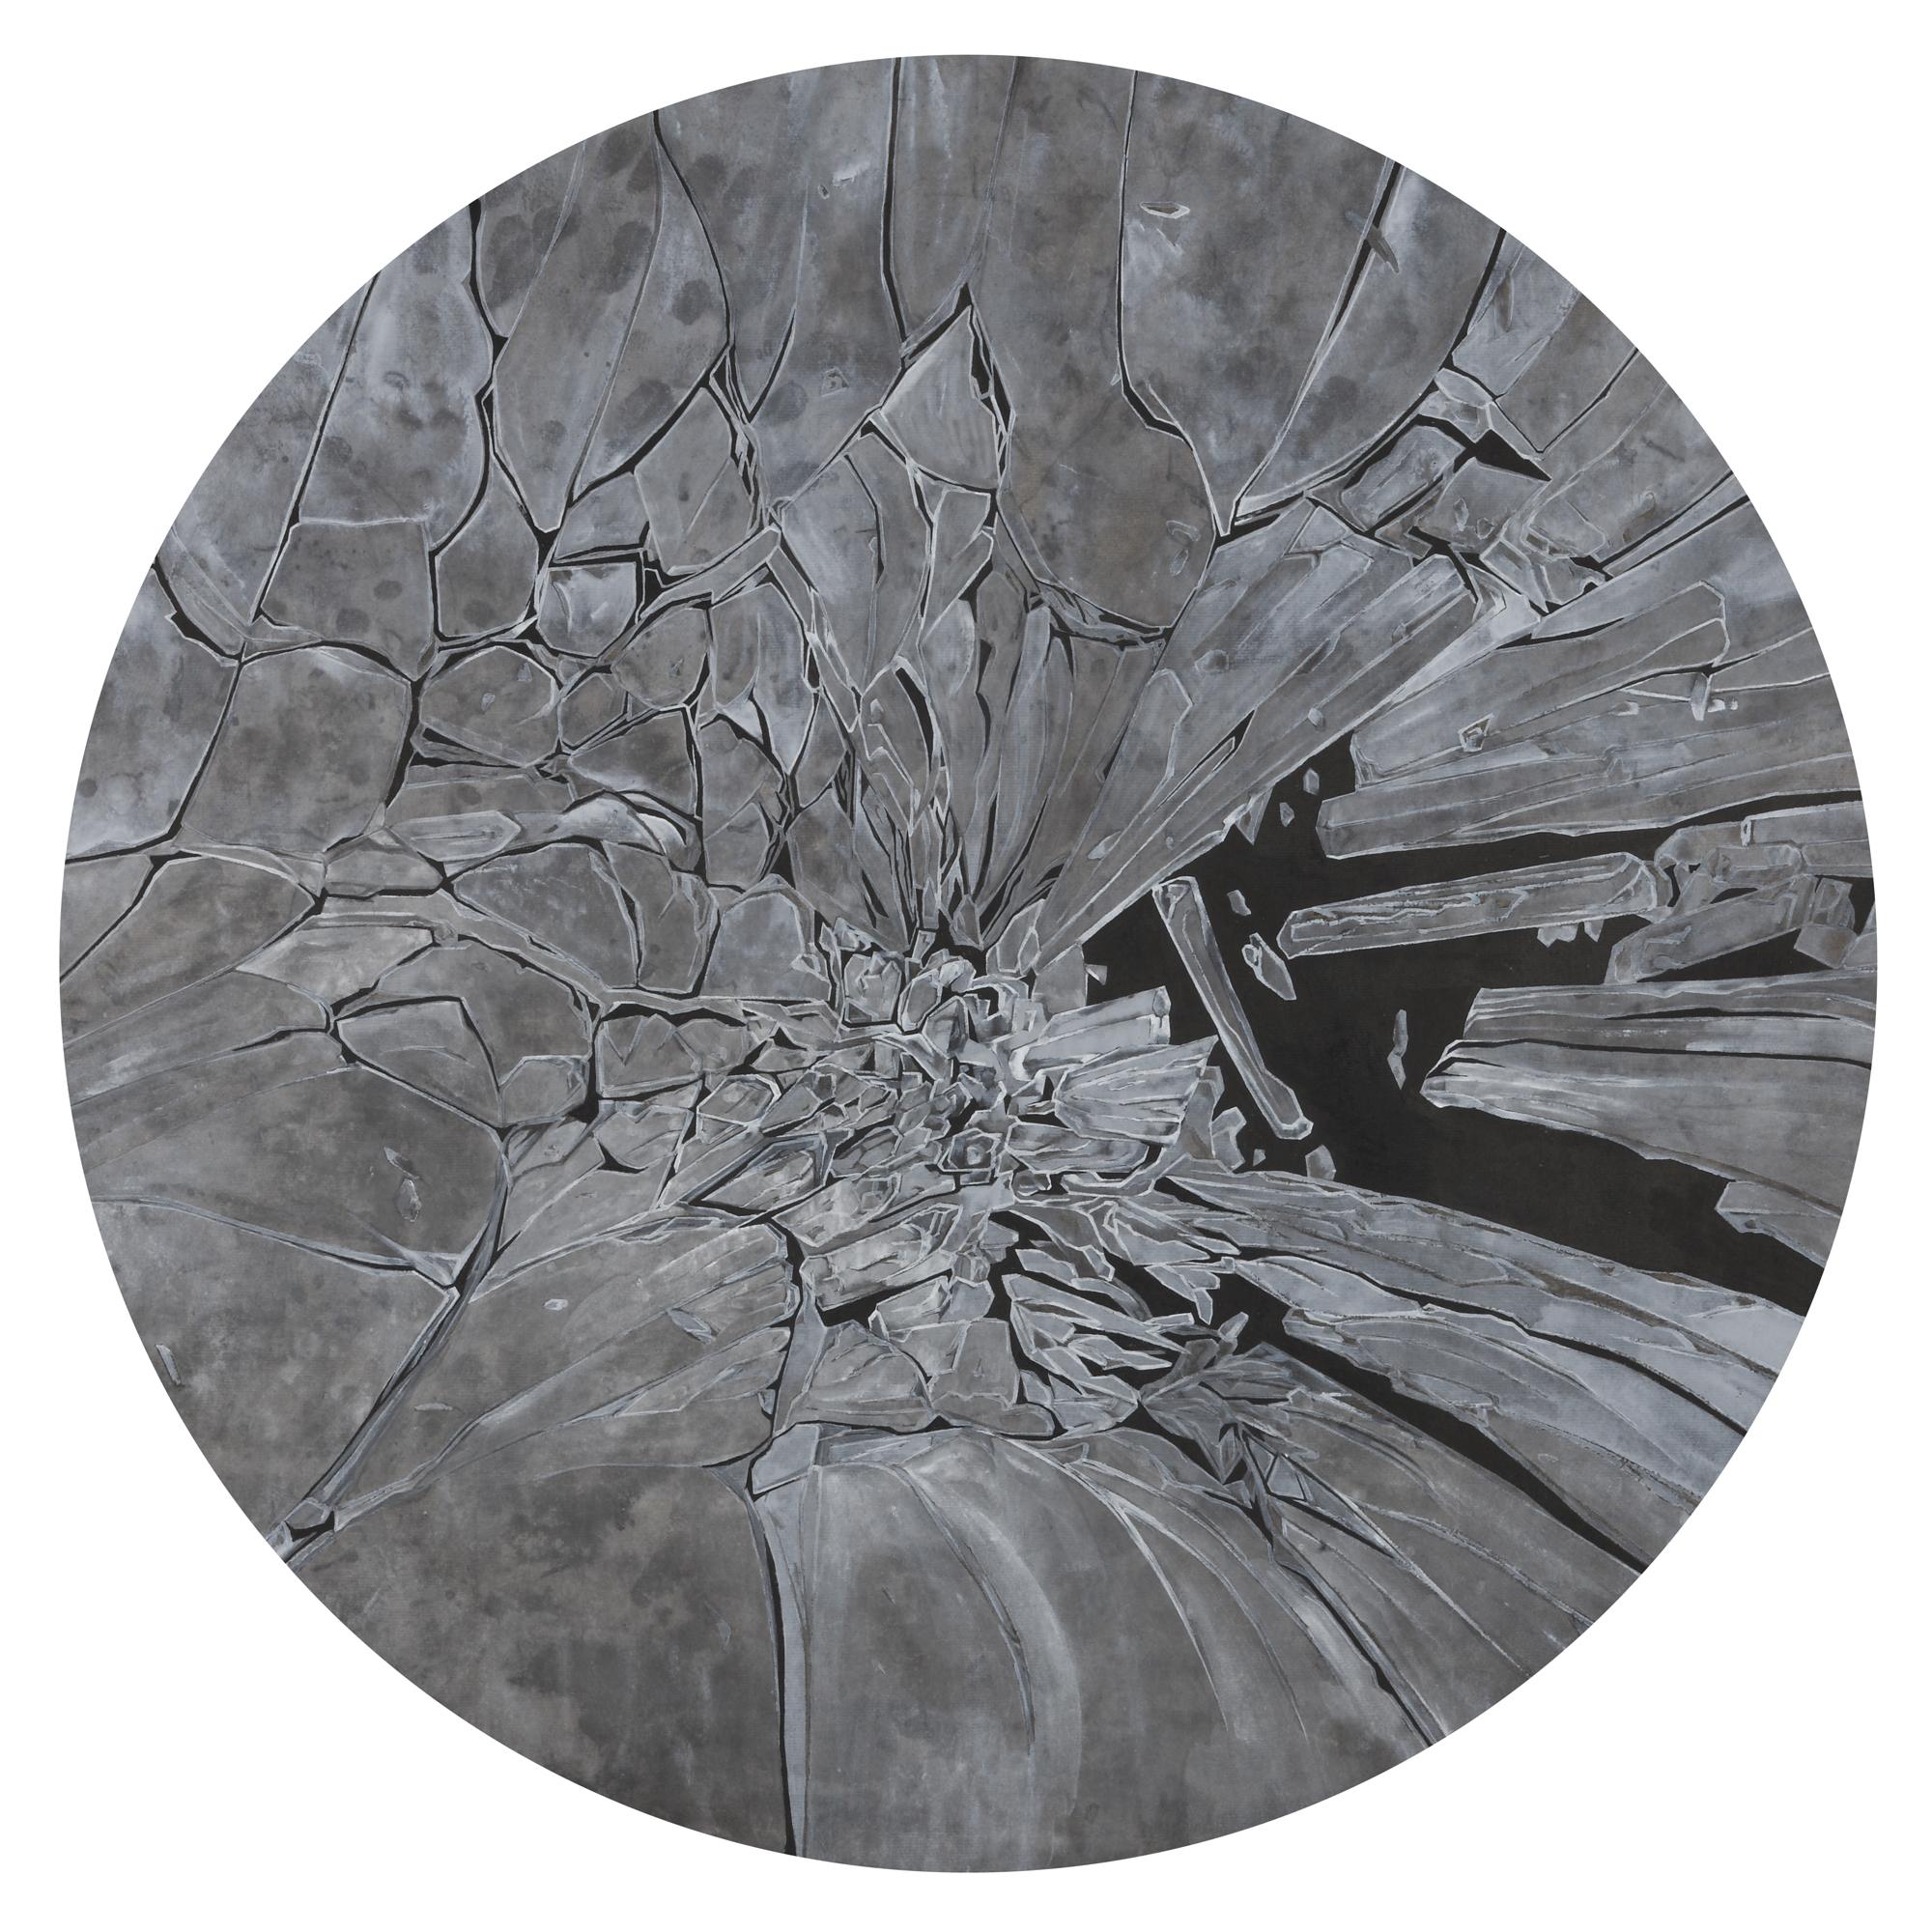 Peng Jian 彭剑, Broken 碎, 2013, Ink and color on paper 纸本水墨设色, Dia 51 cm